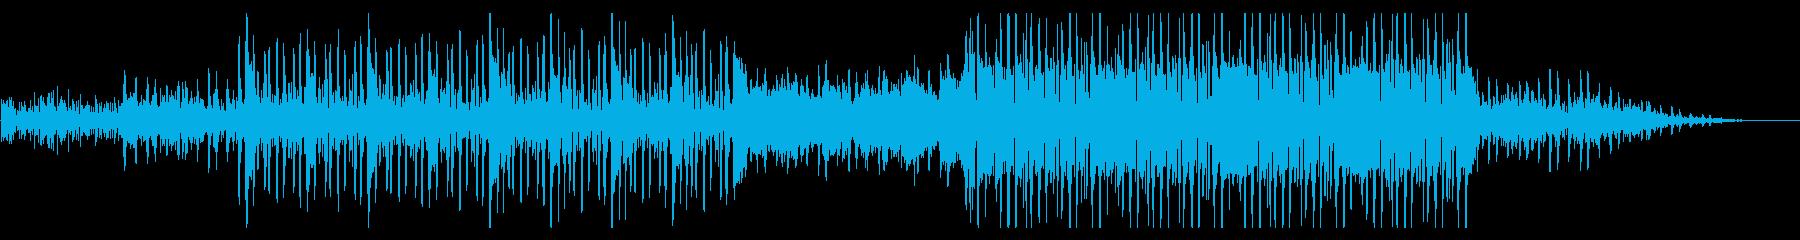 texture7の再生済みの波形